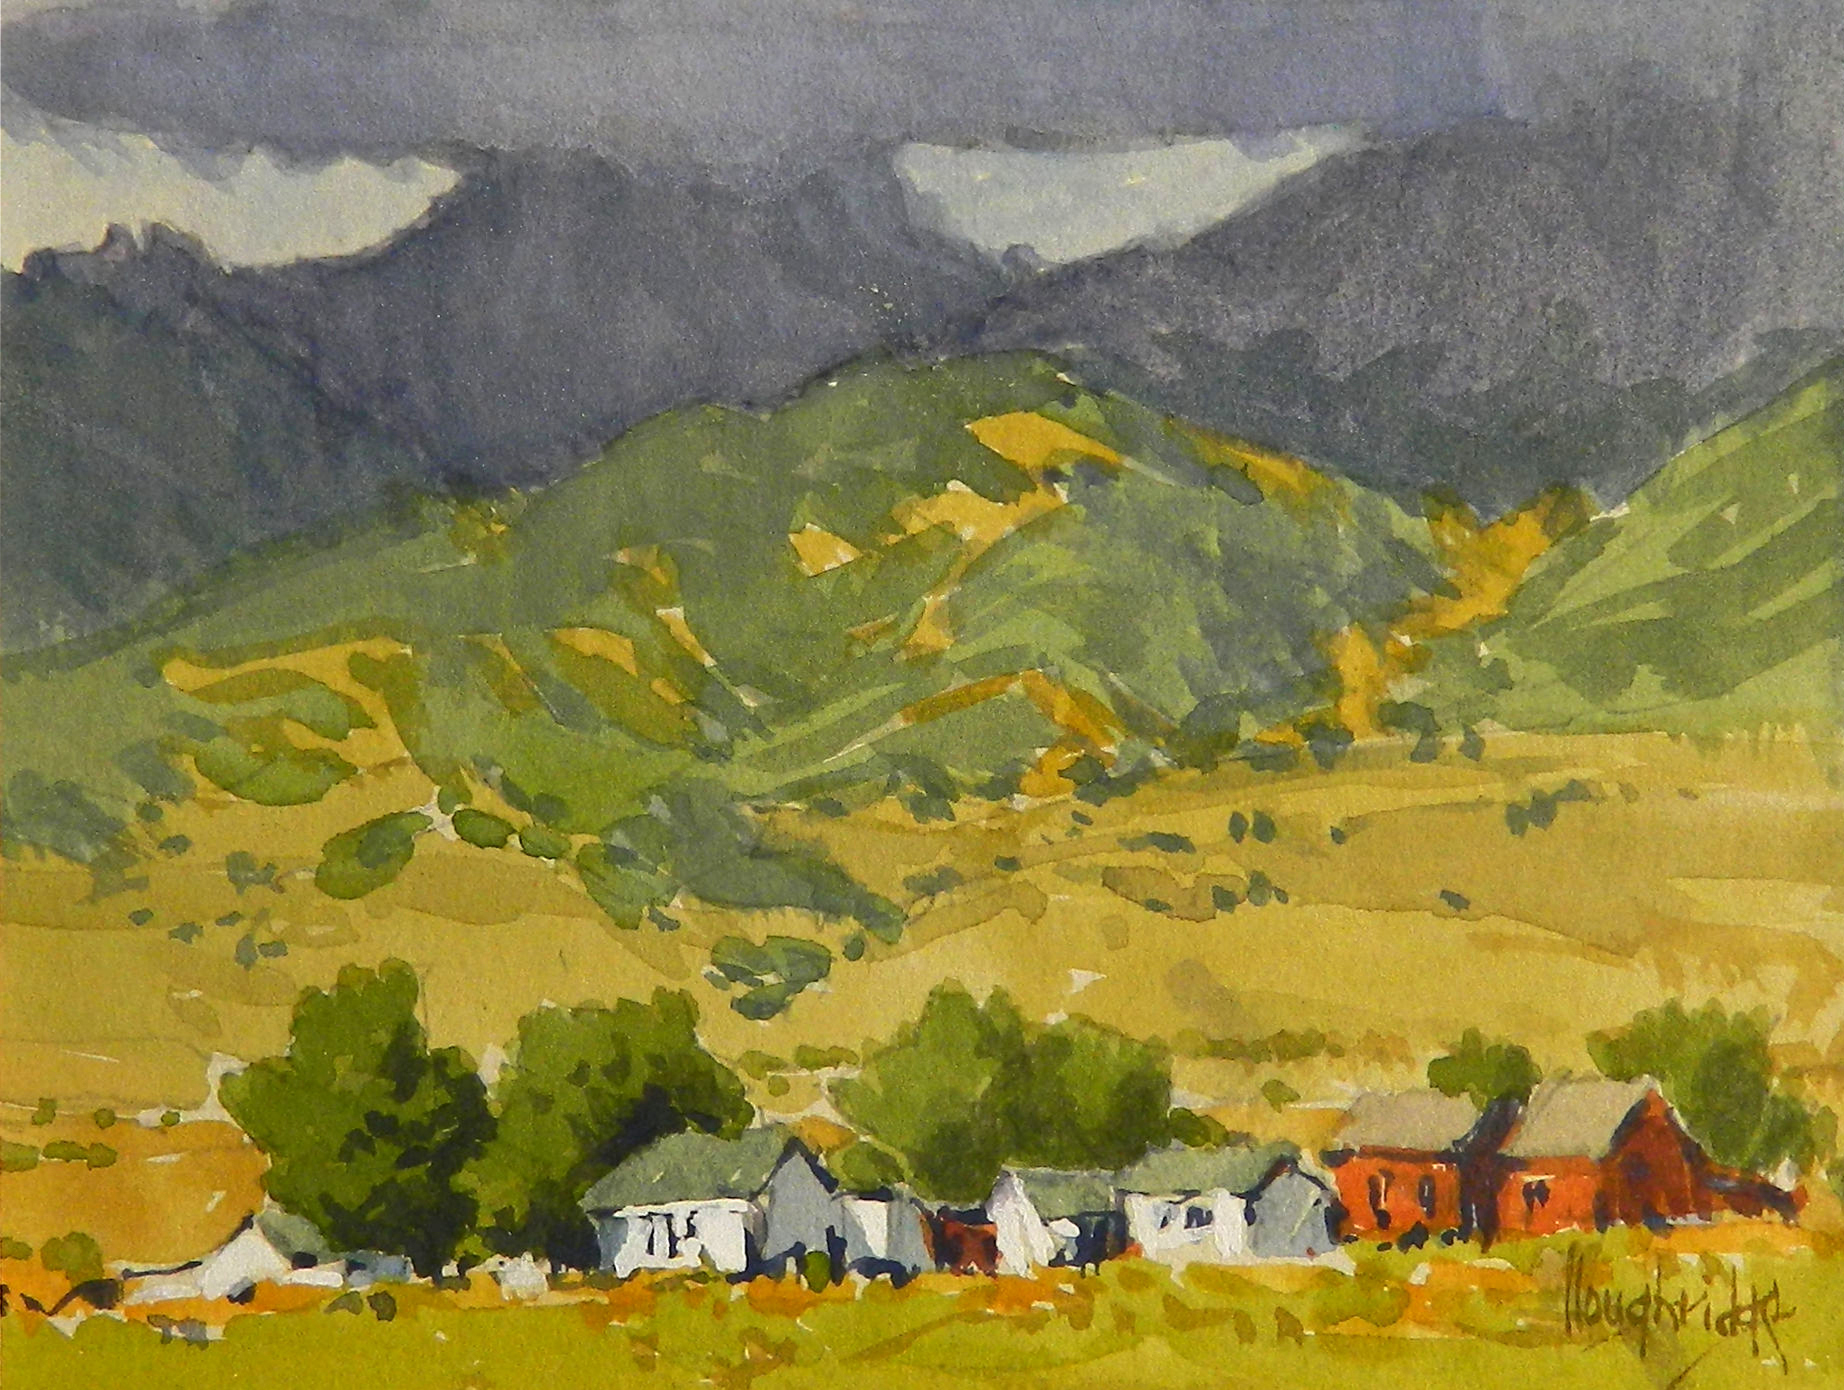 Leon Loughridge - Westcliffe Ranch